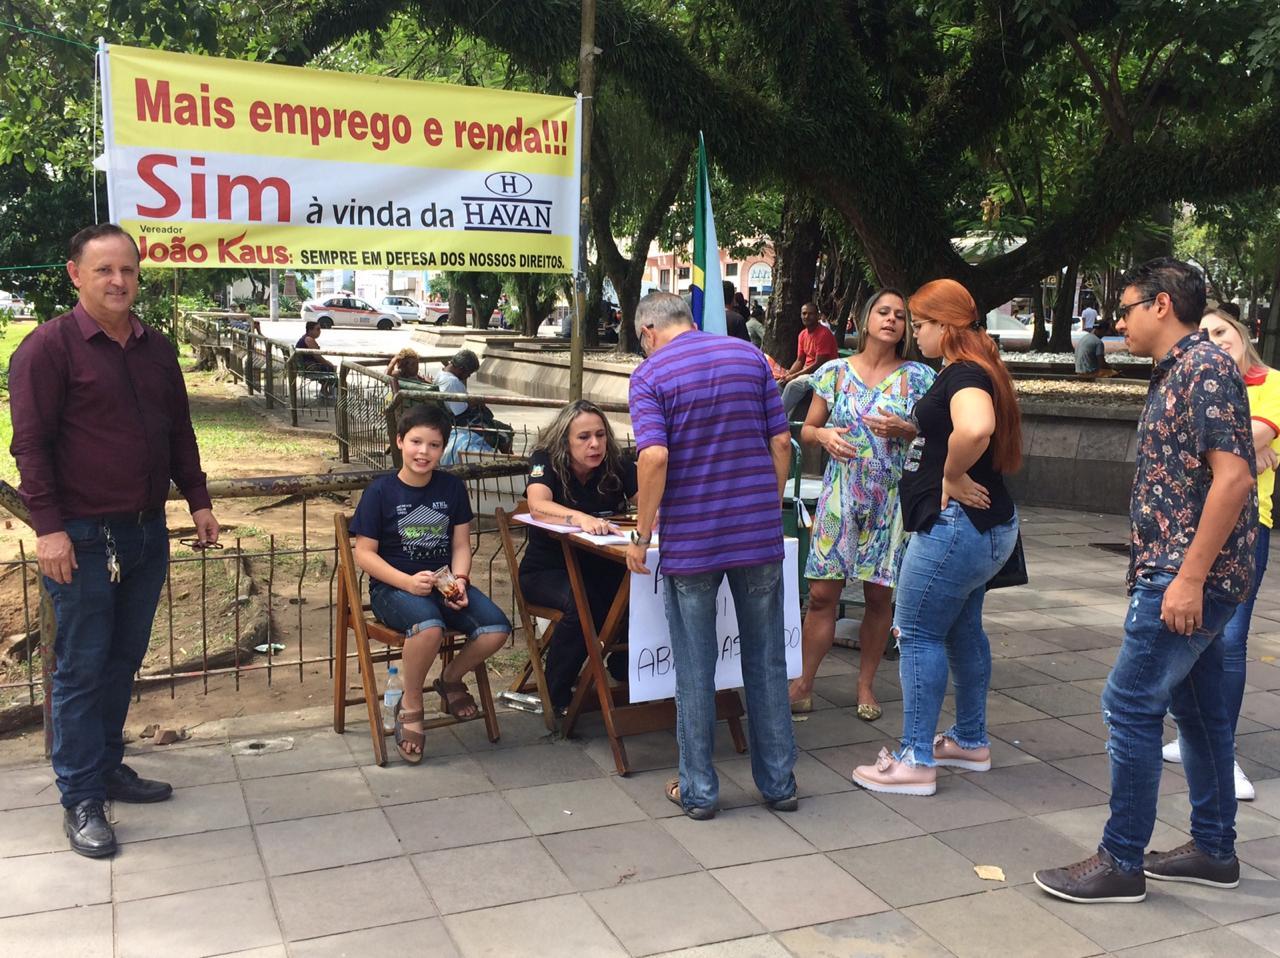 Foto de SOBE/DESCE. Kaus, Guerra, Deili, Bolinha… Confira os destaques da semana na política santa-mariense